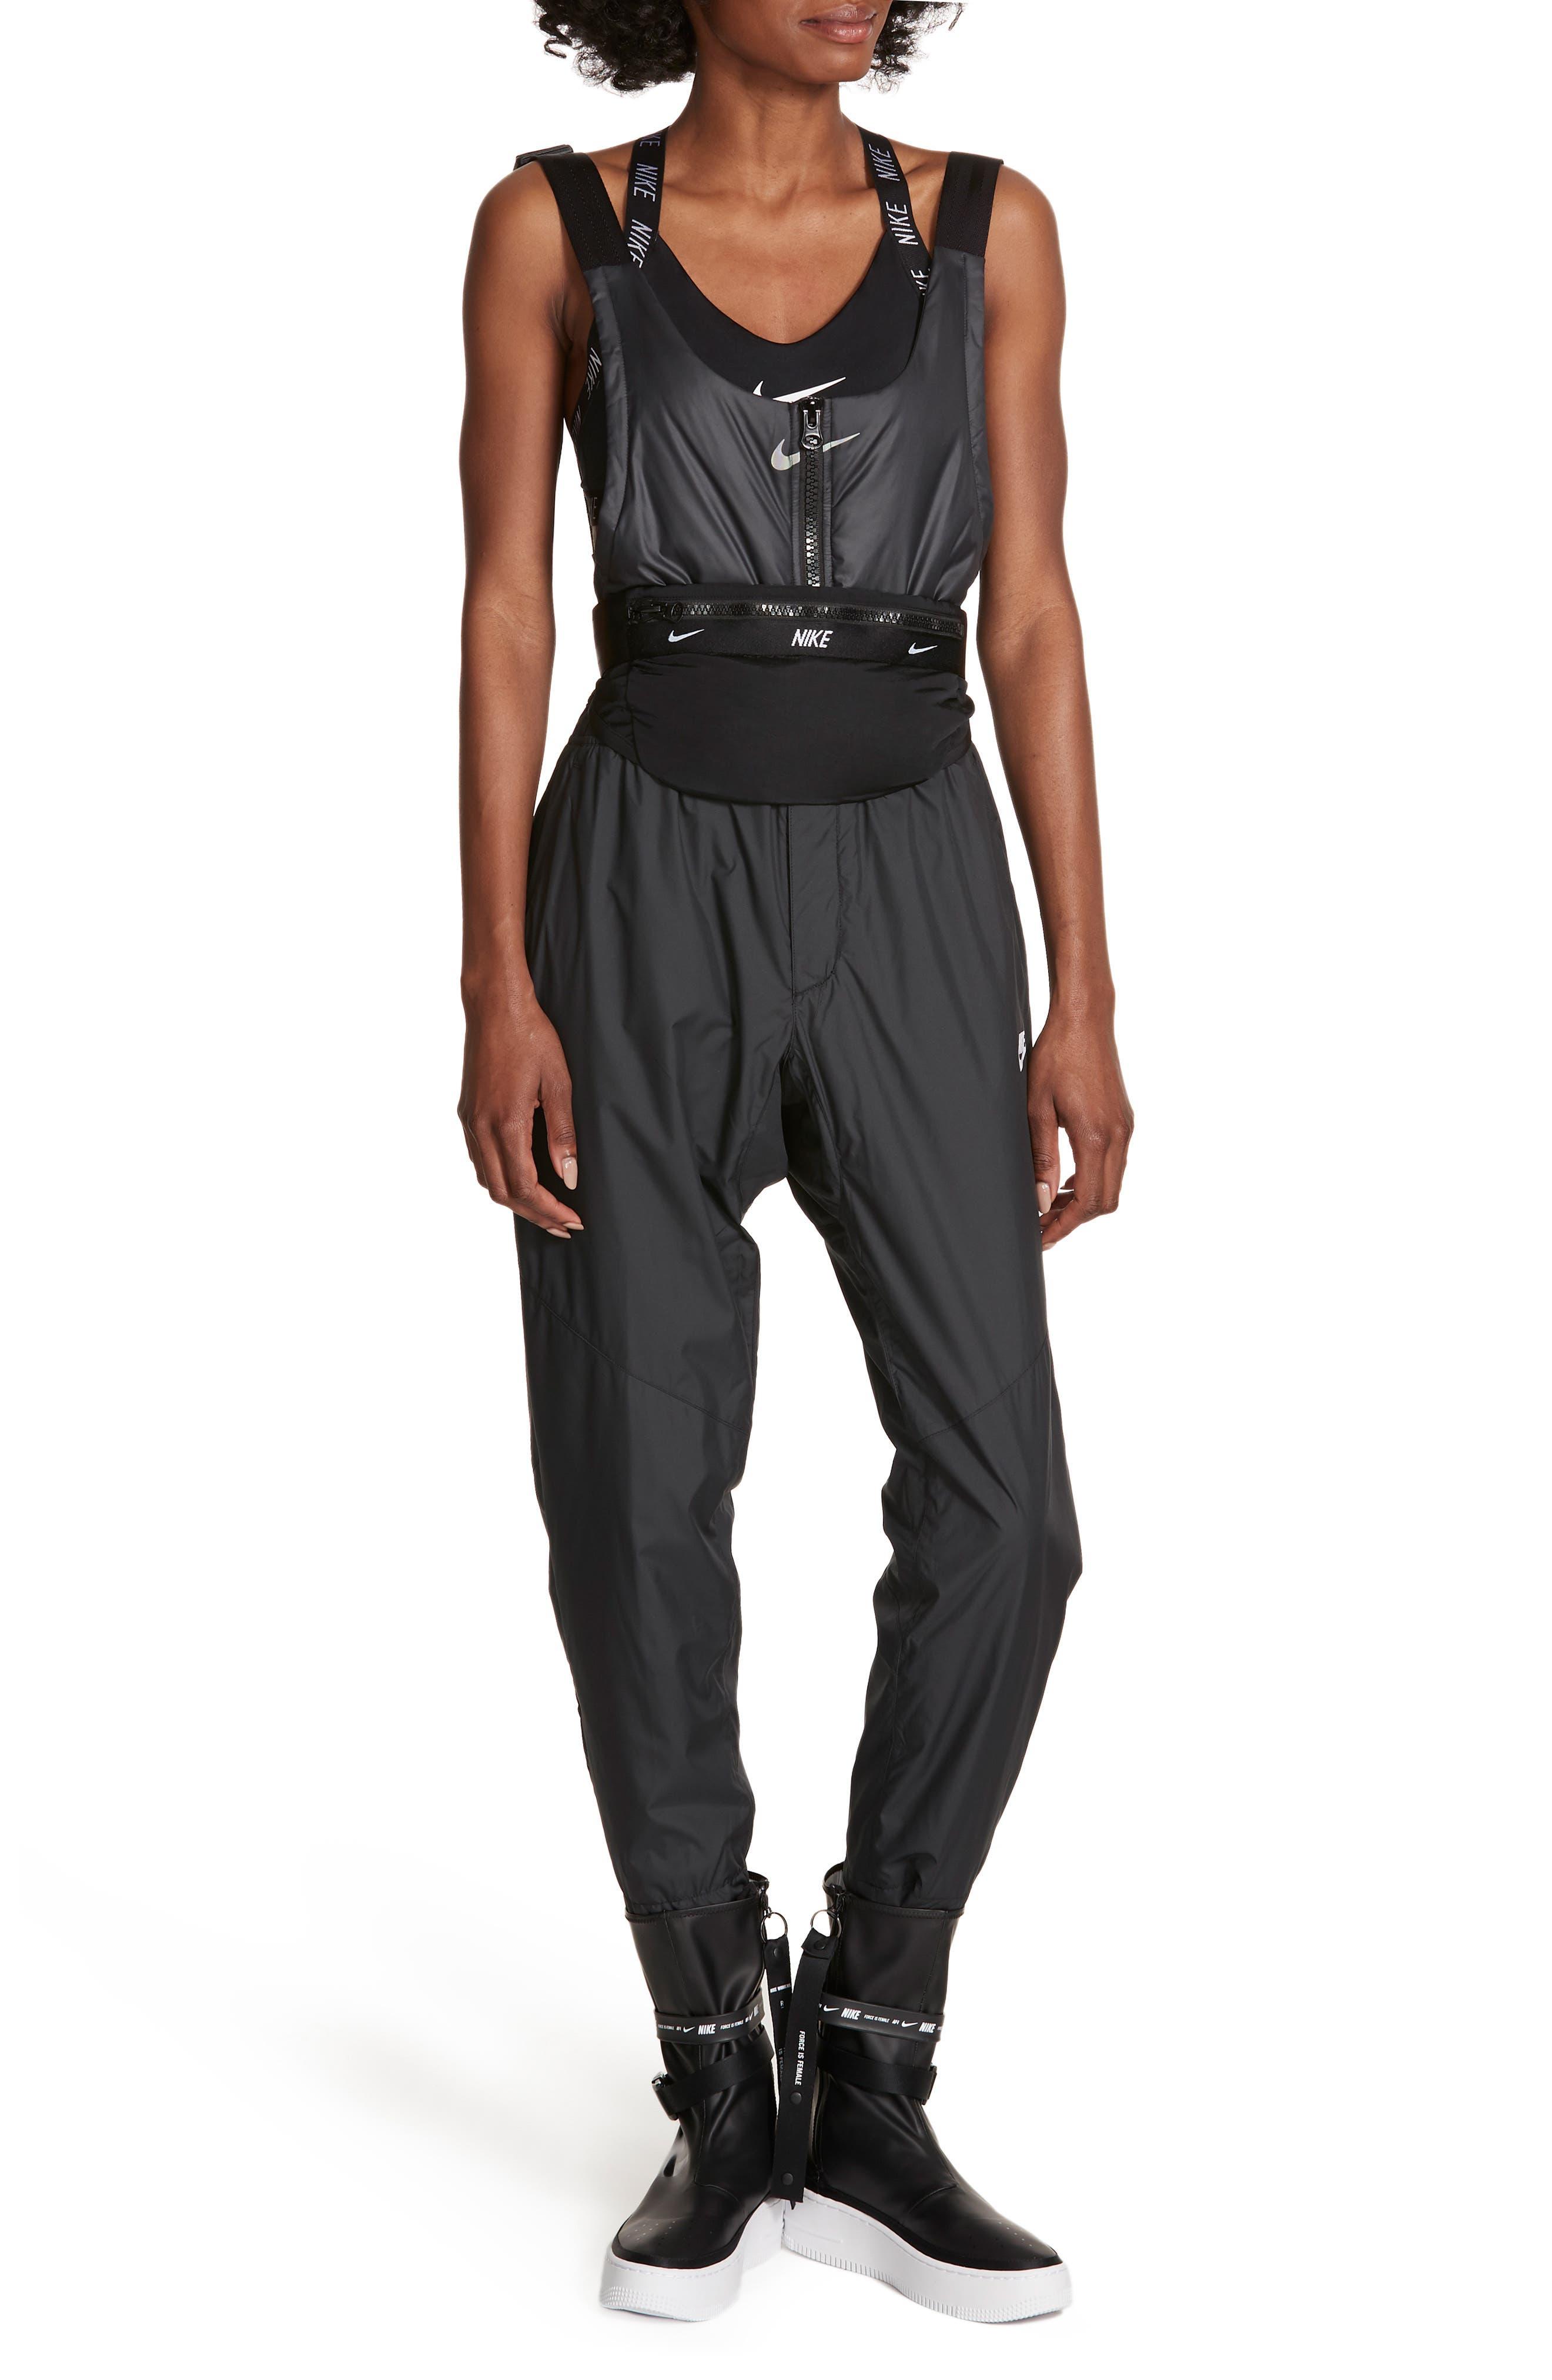 x Dianne Garcia Overalls,                         Main,                         color, BLACK